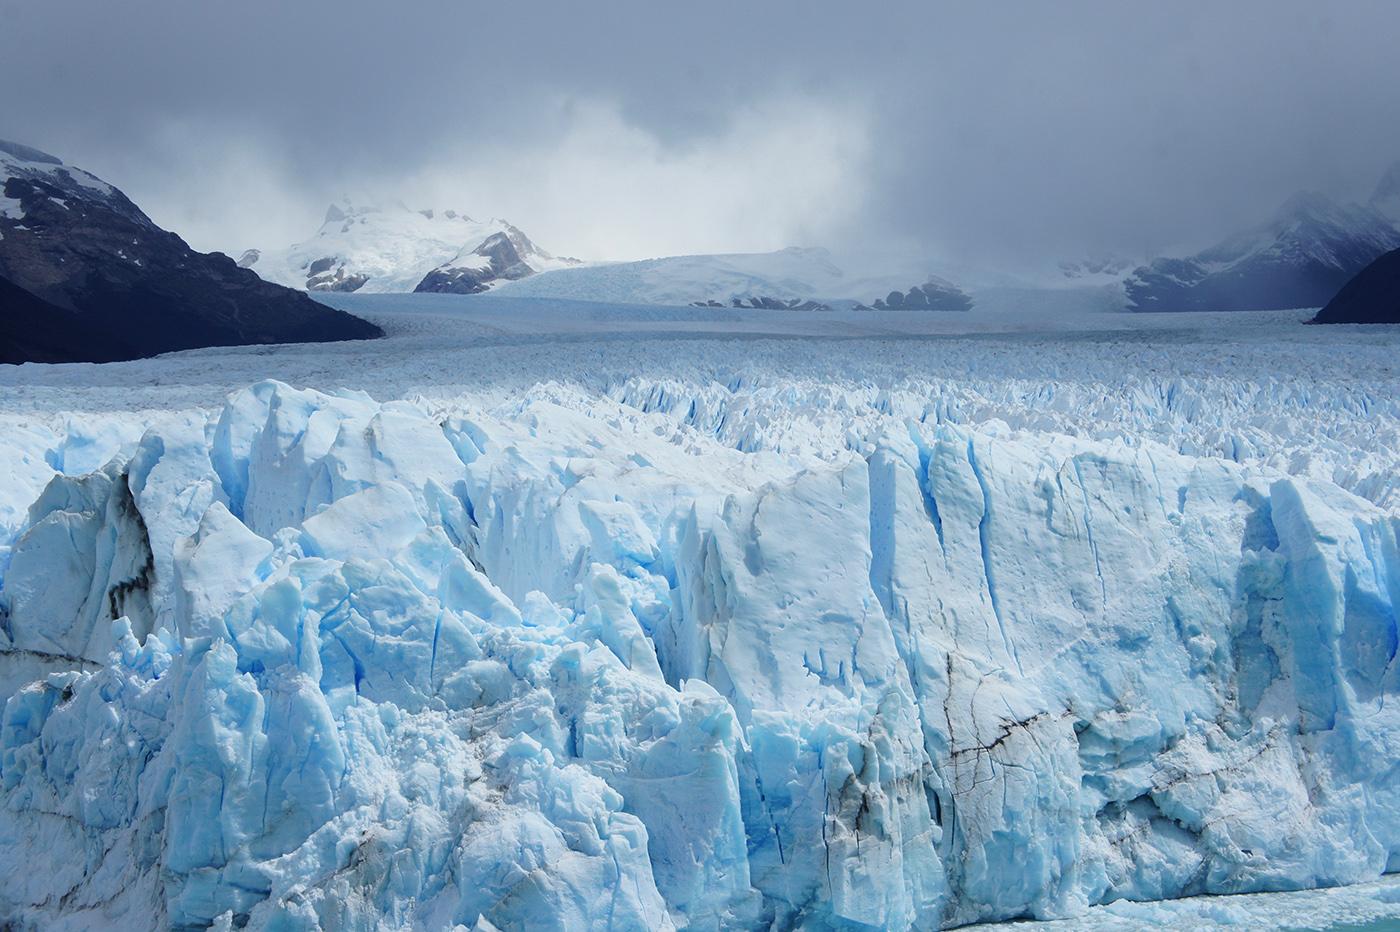 Les glaces millénaires du Perito Moreno